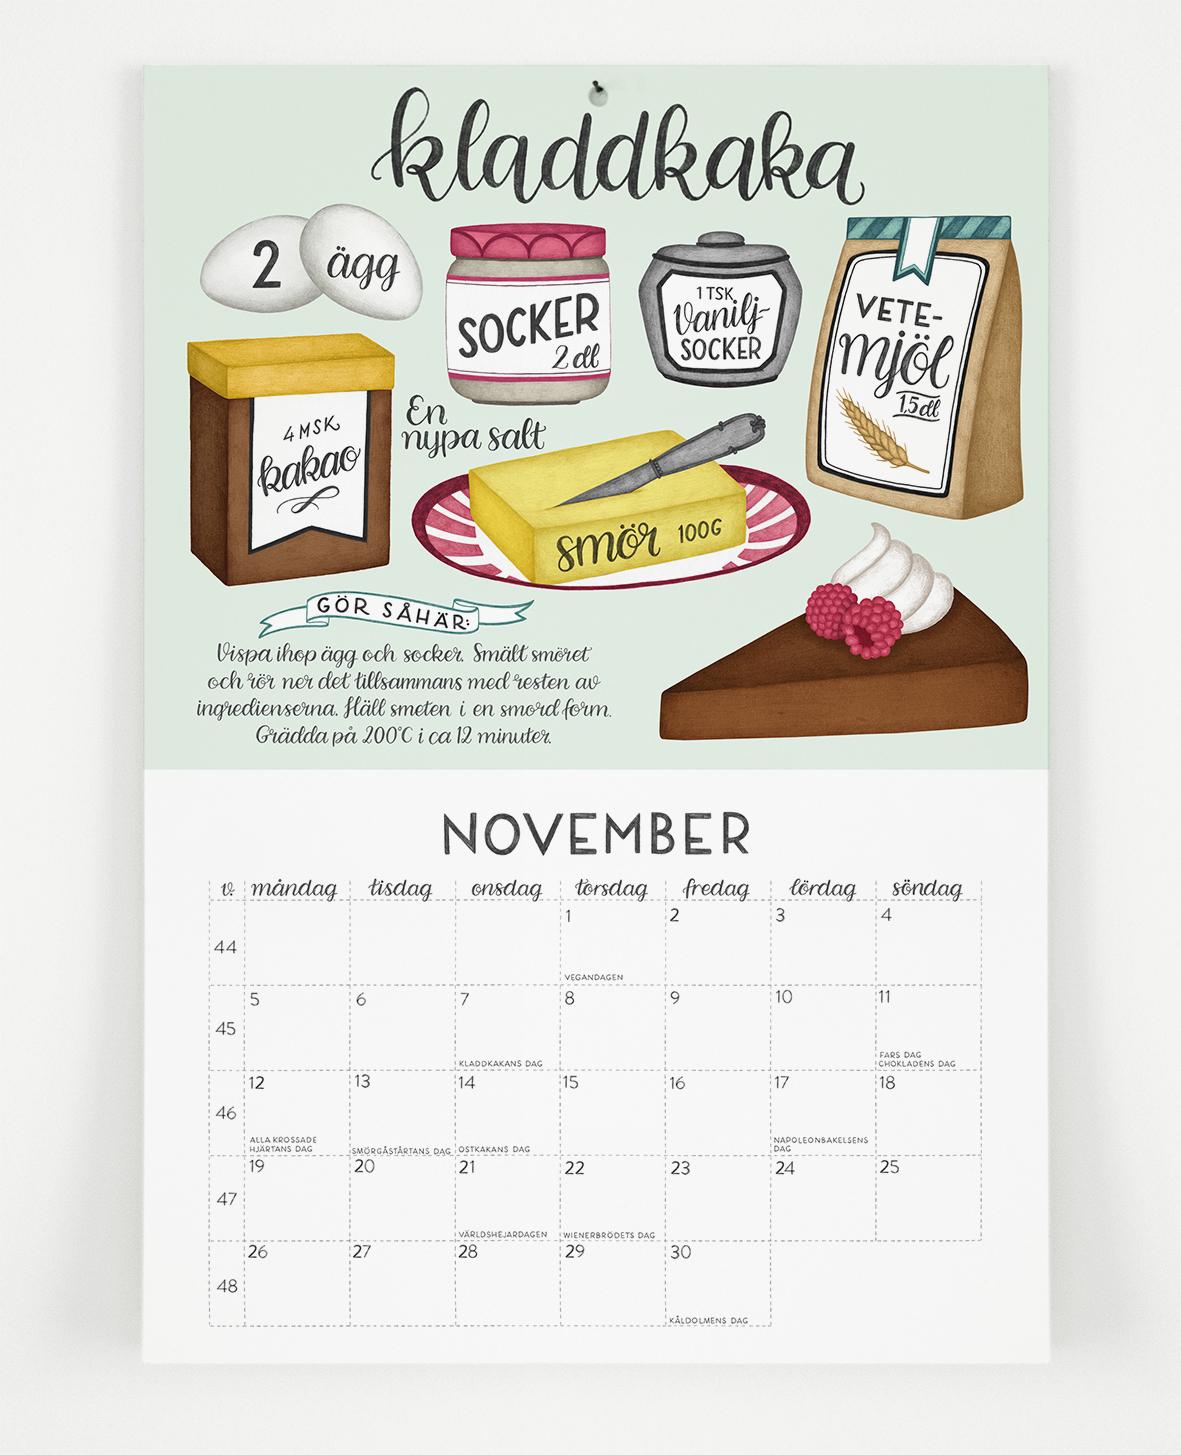 Tovelisa_kalender_kladdkaka